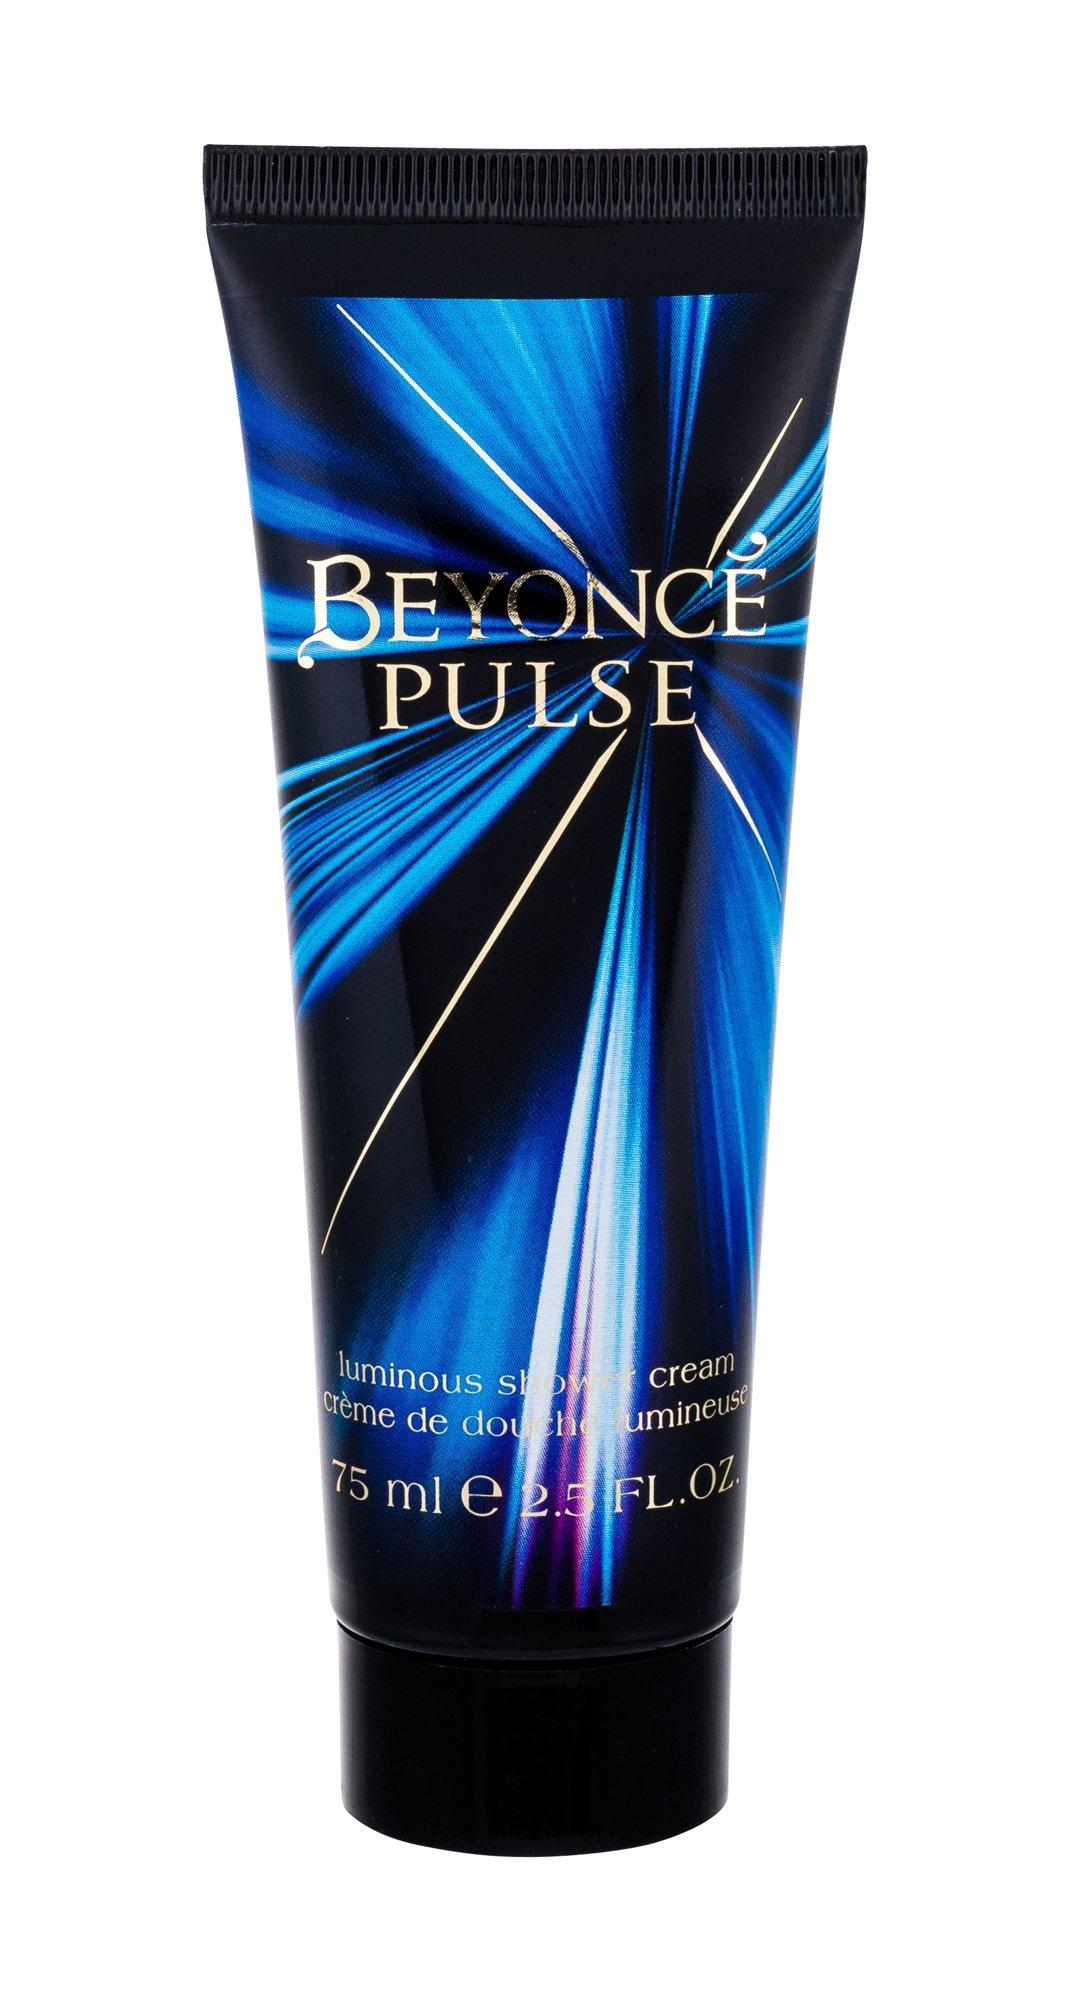 Beyonce Pulse Shower Cream 75ml